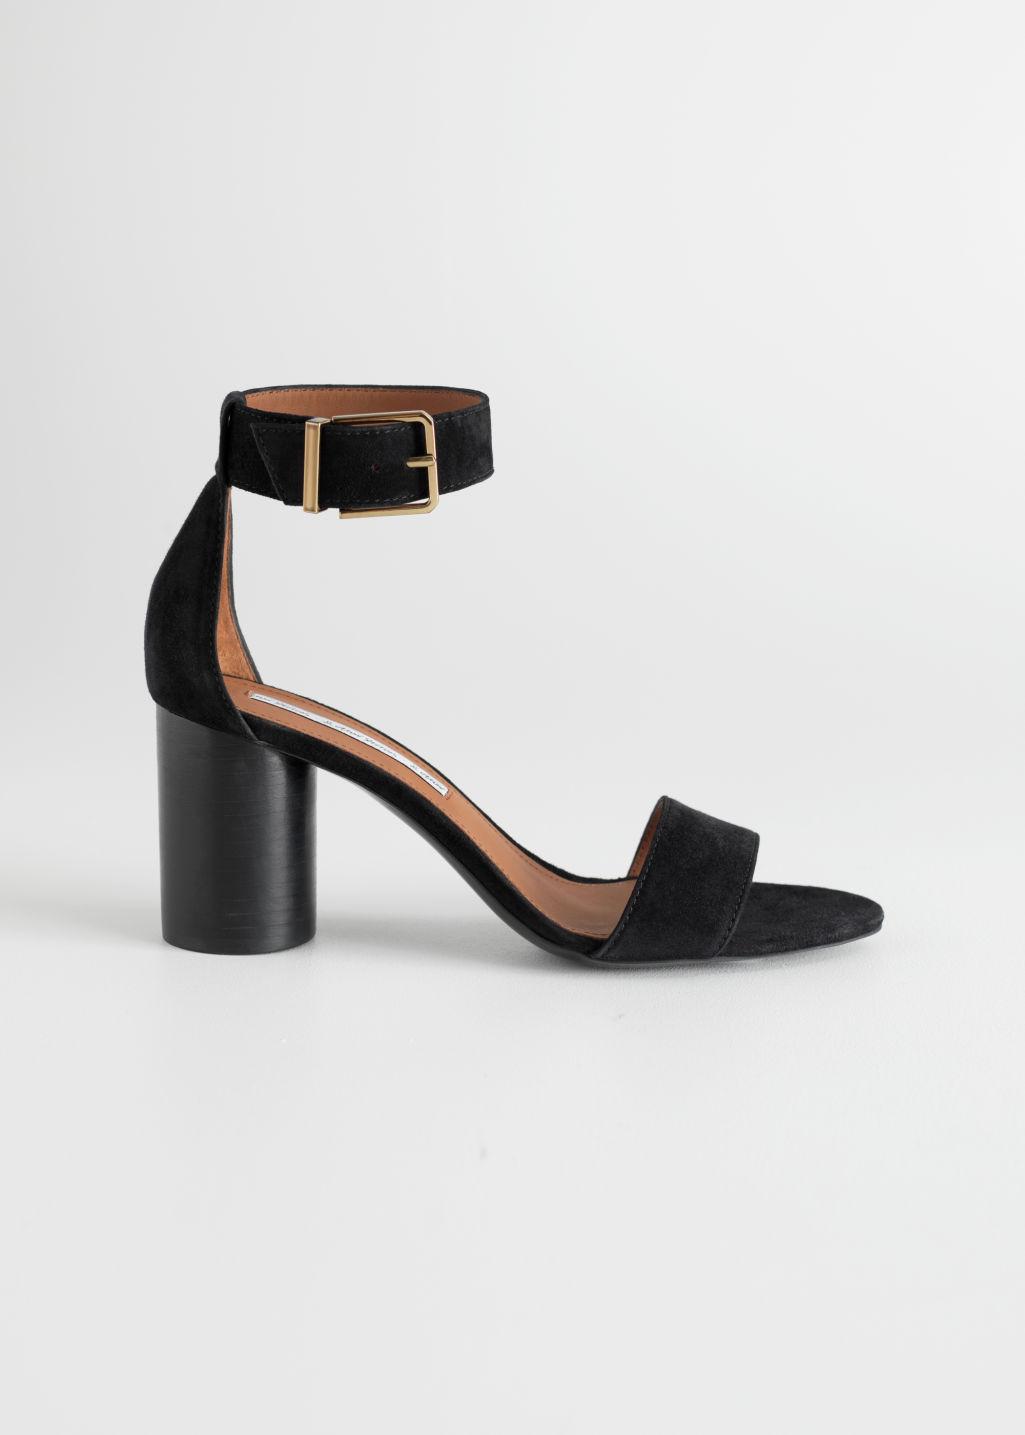 Skor online   Shoppa stort utbud av skor   Afound